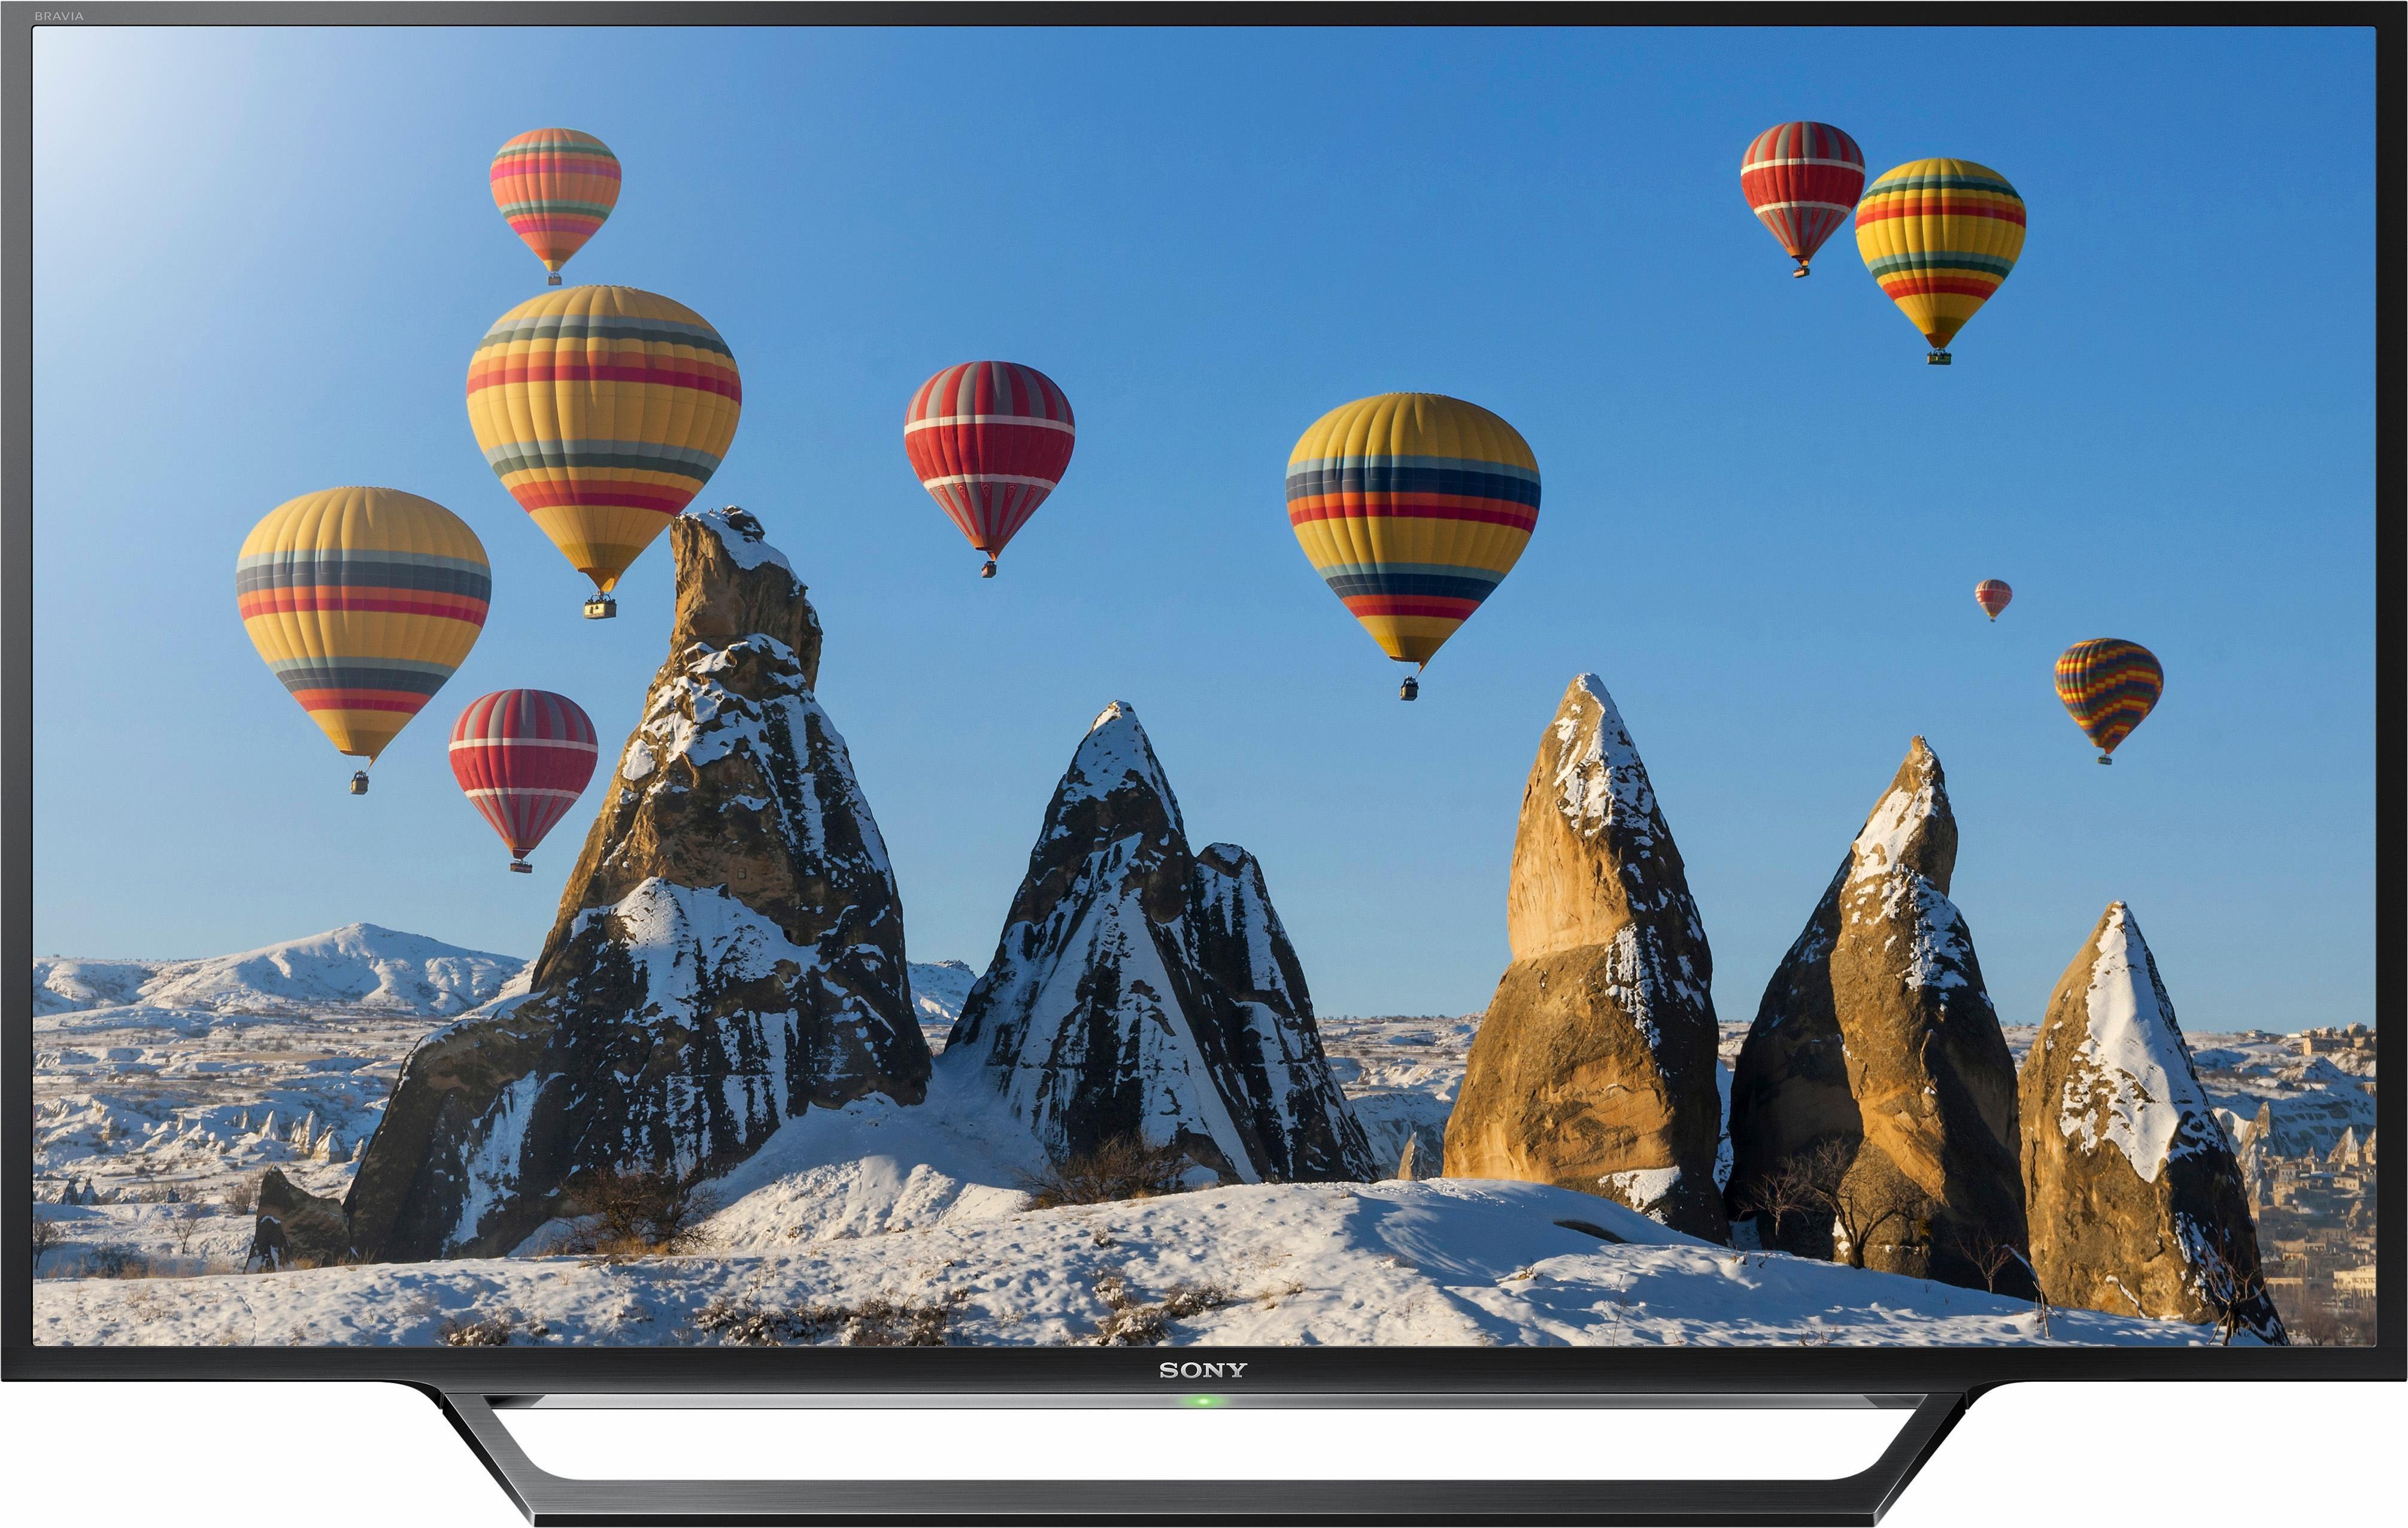 Sony BRAVIA KDL-40WD655, LED Fernseher, 102 cm (40 Zoll), 1080p (Full HD), Smart-TV